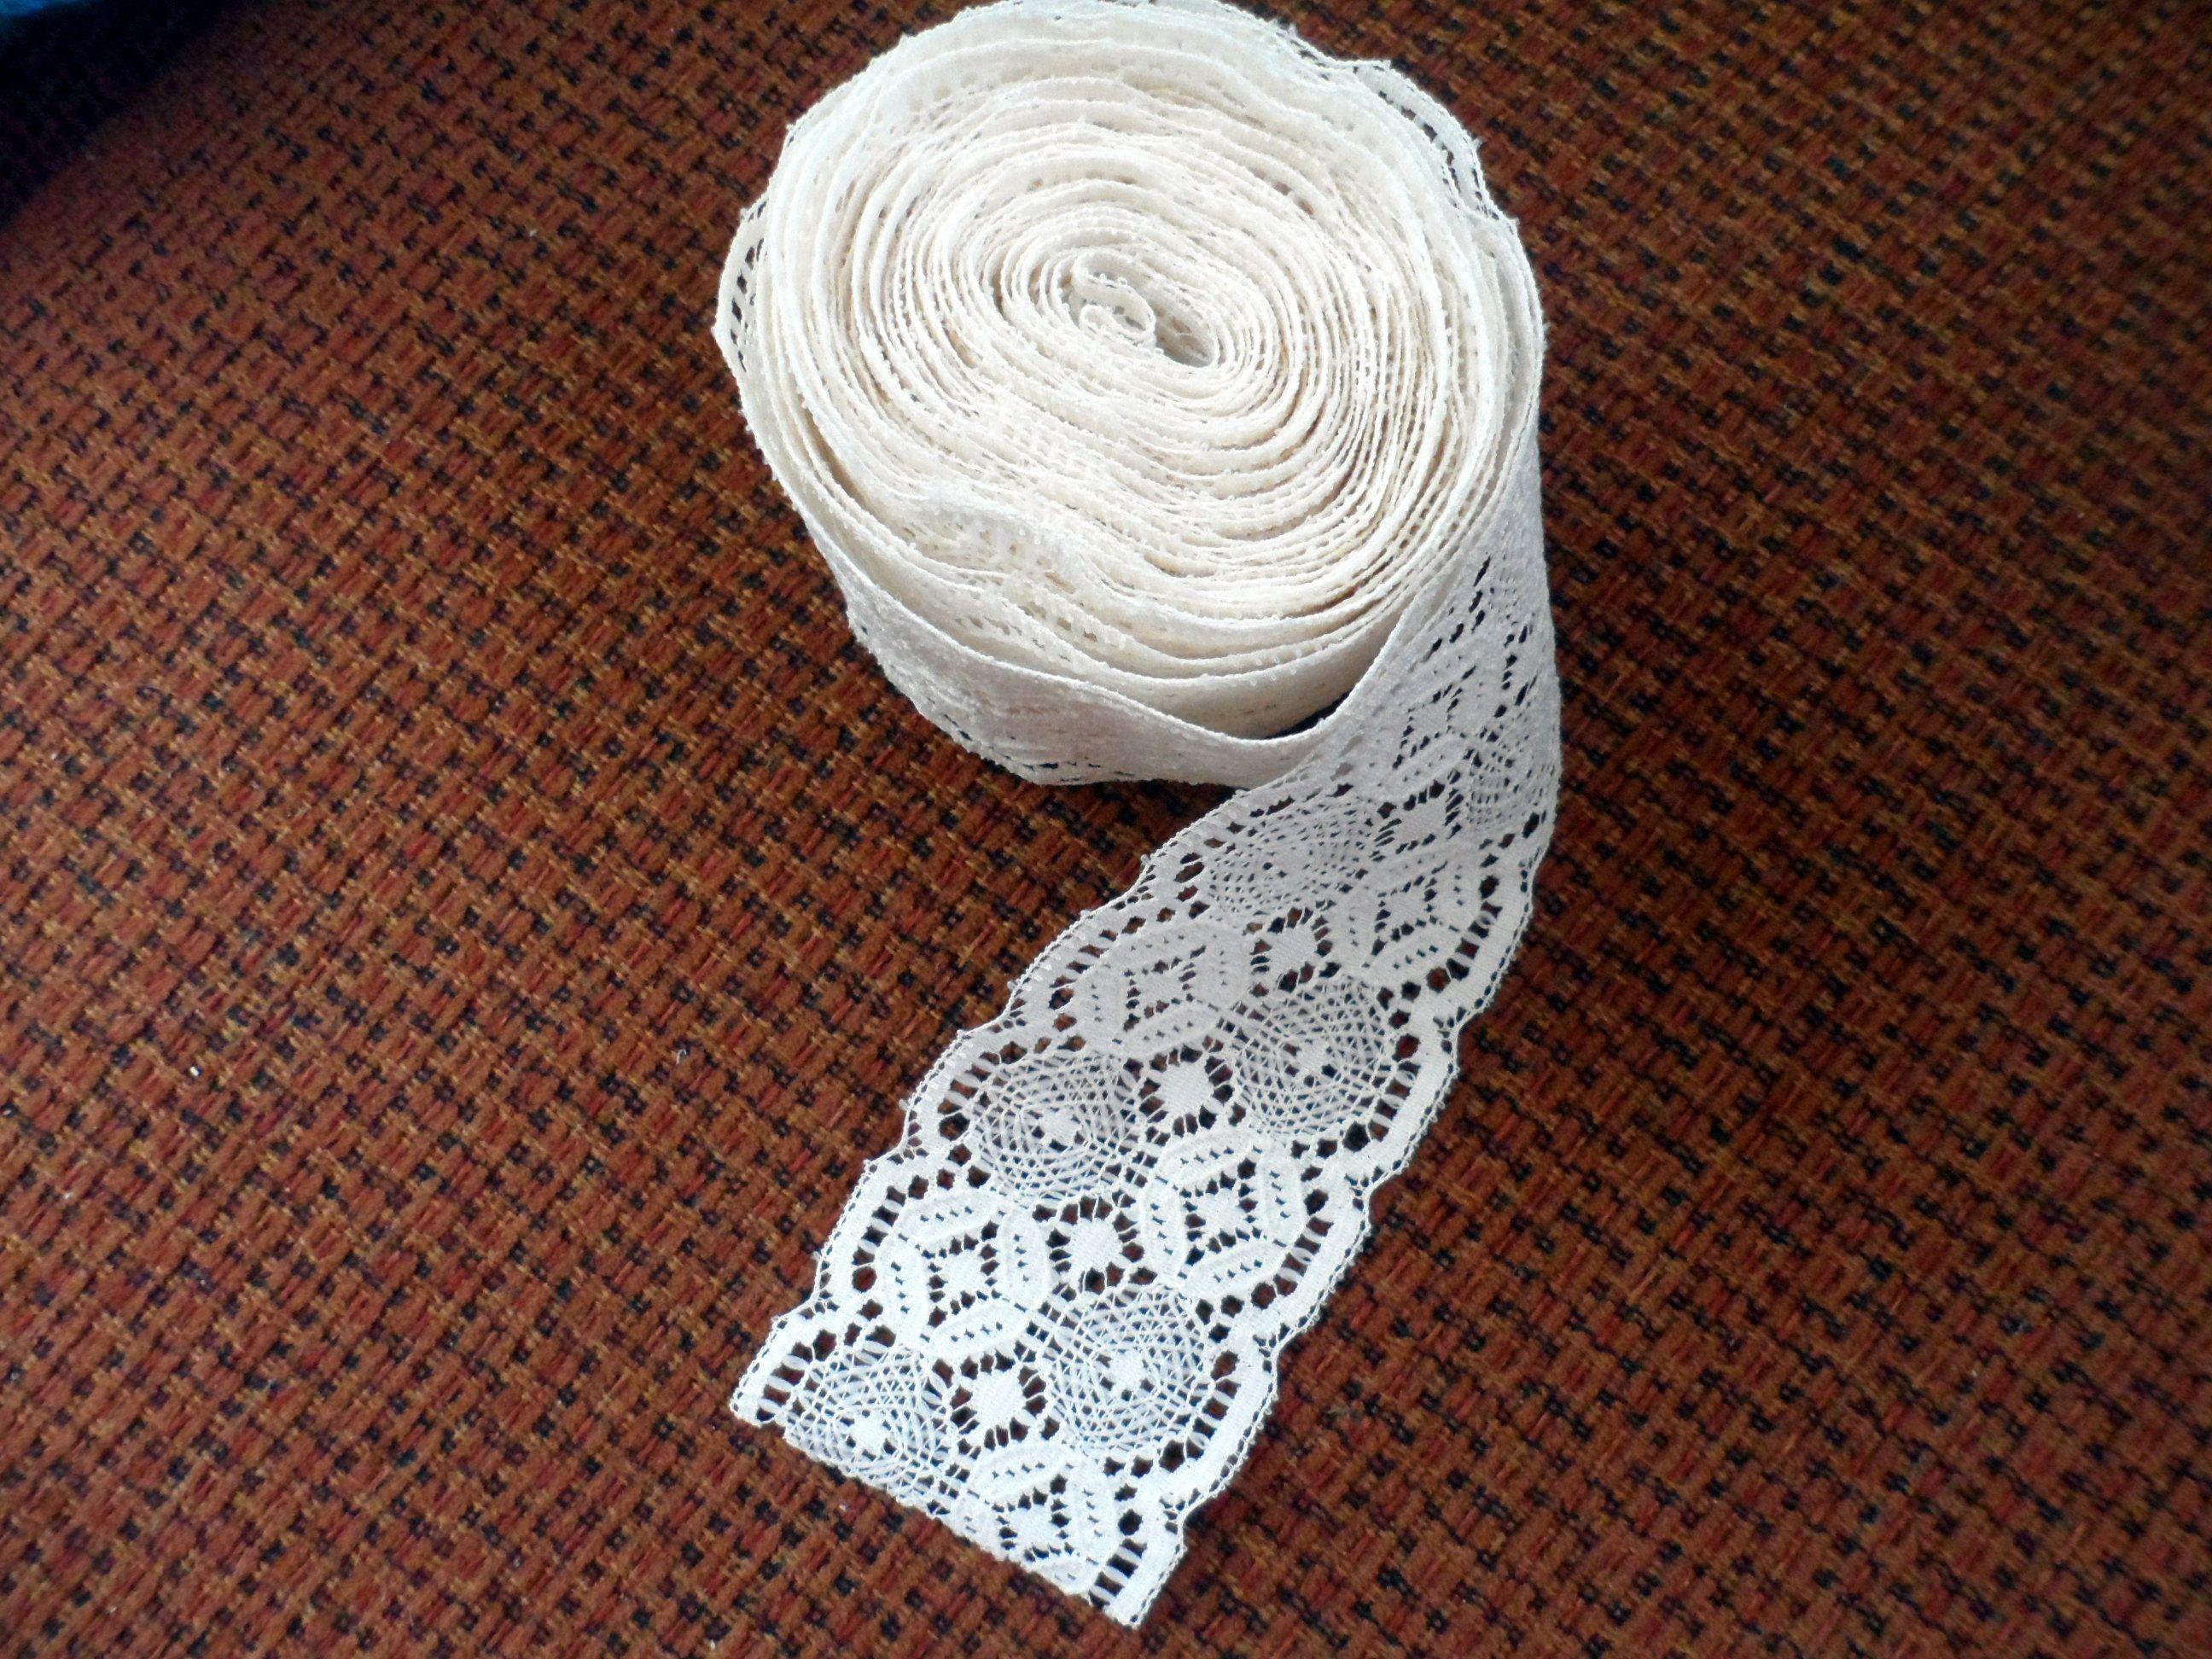 Vintage Ecru Cream Colored Cotton Lace Trim Flat Lace Trim Cream